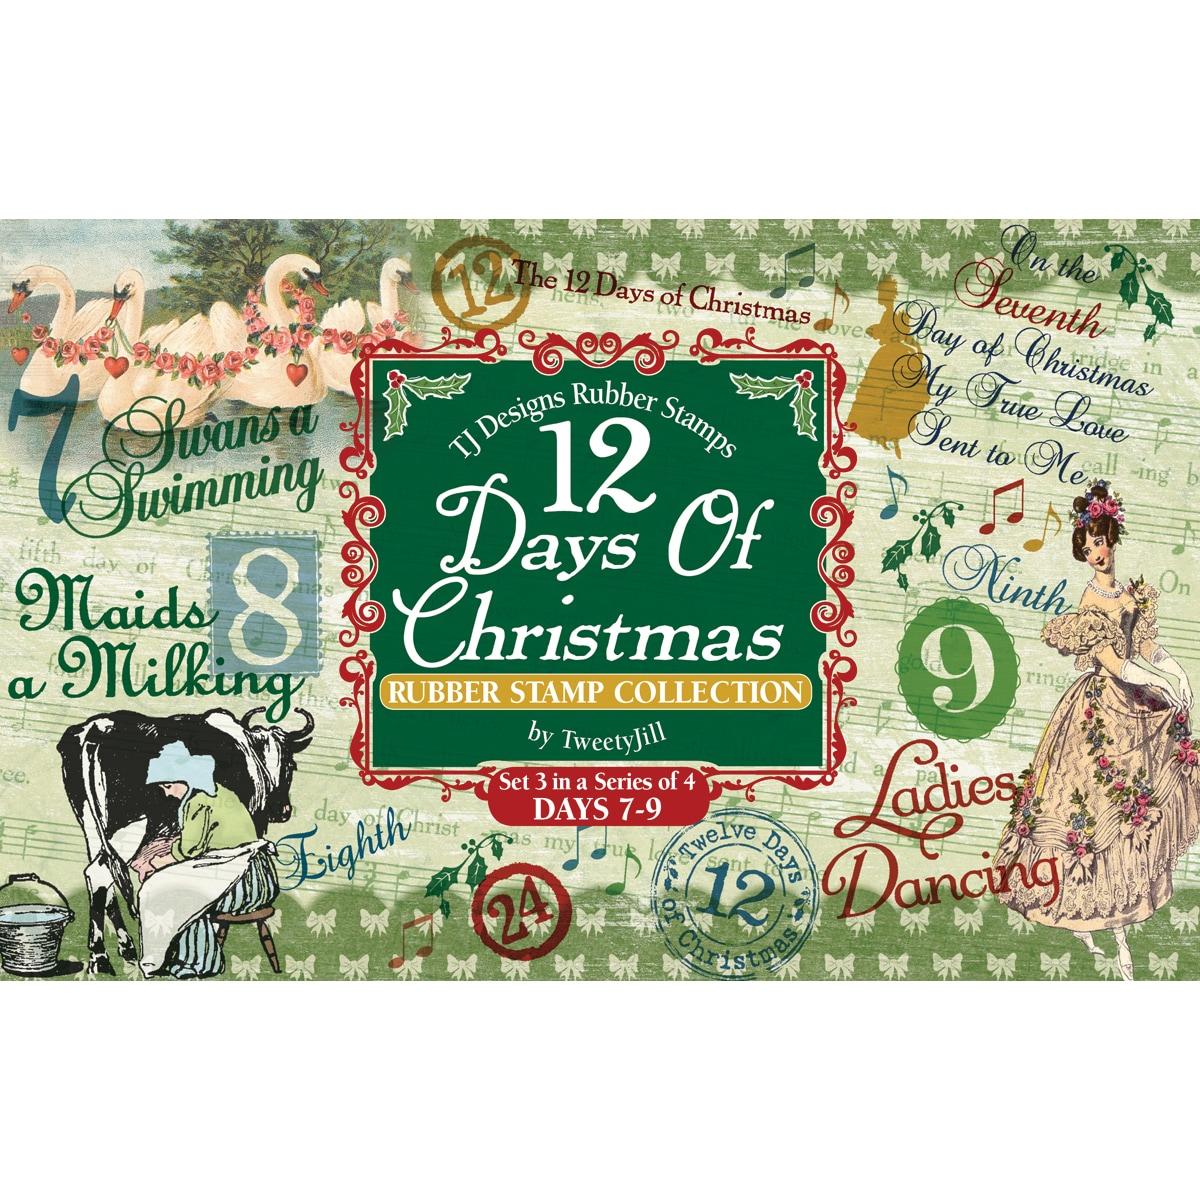 Rubber Stamp Set-12 Days Of Christmas Set 3 Days 7-9